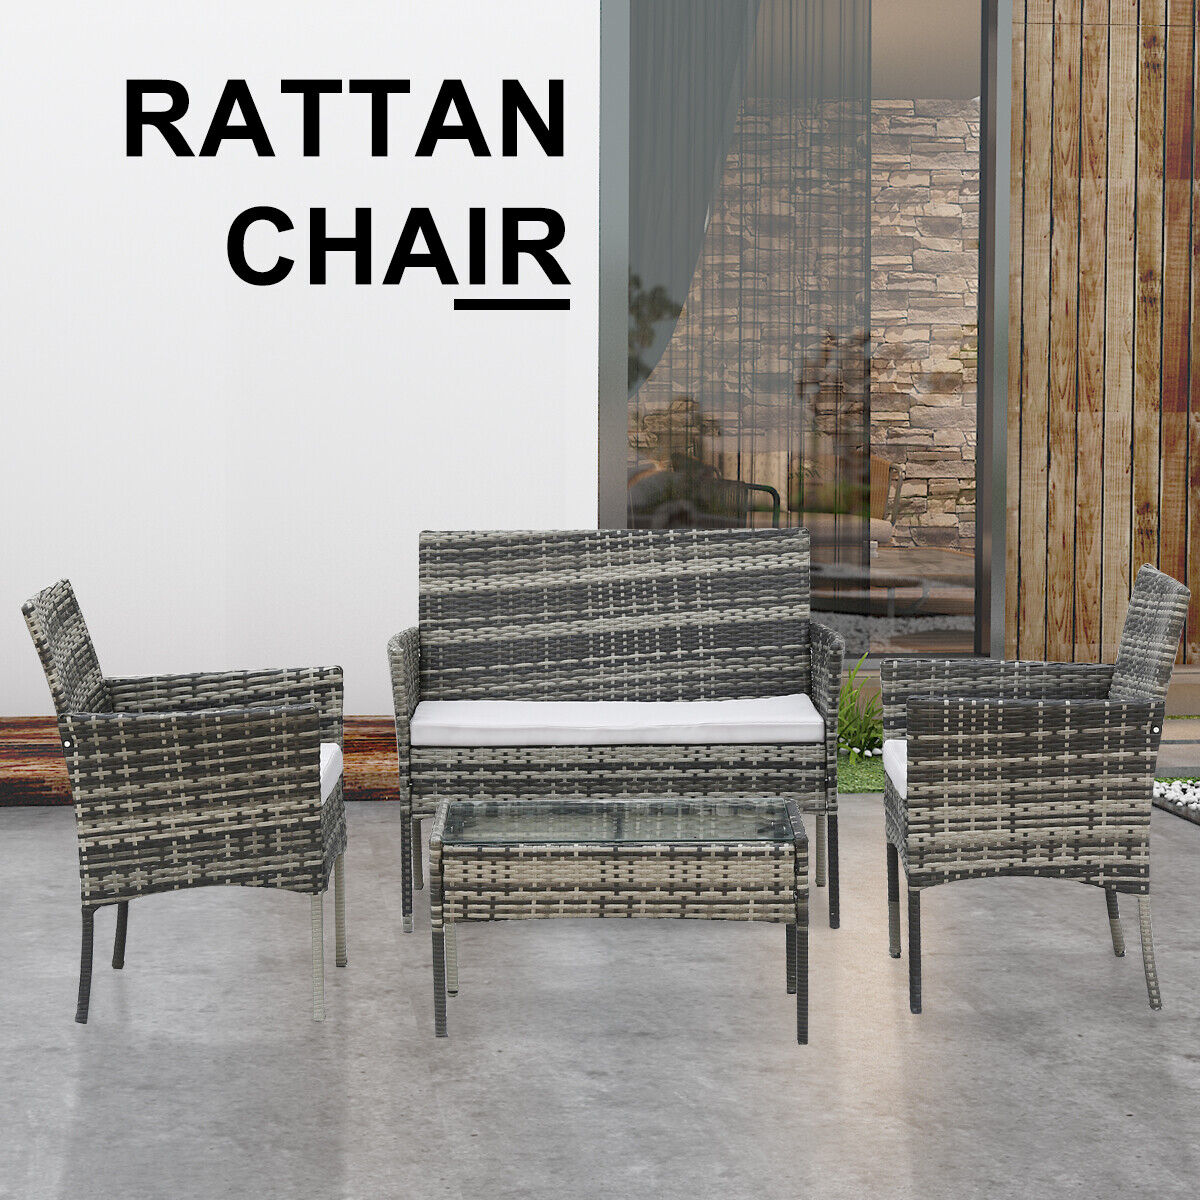 Garden Furniture - Rattan Garden Furniture Set 4 Piece Chairs Sofa Coffee Table Outdoor Patio Sets